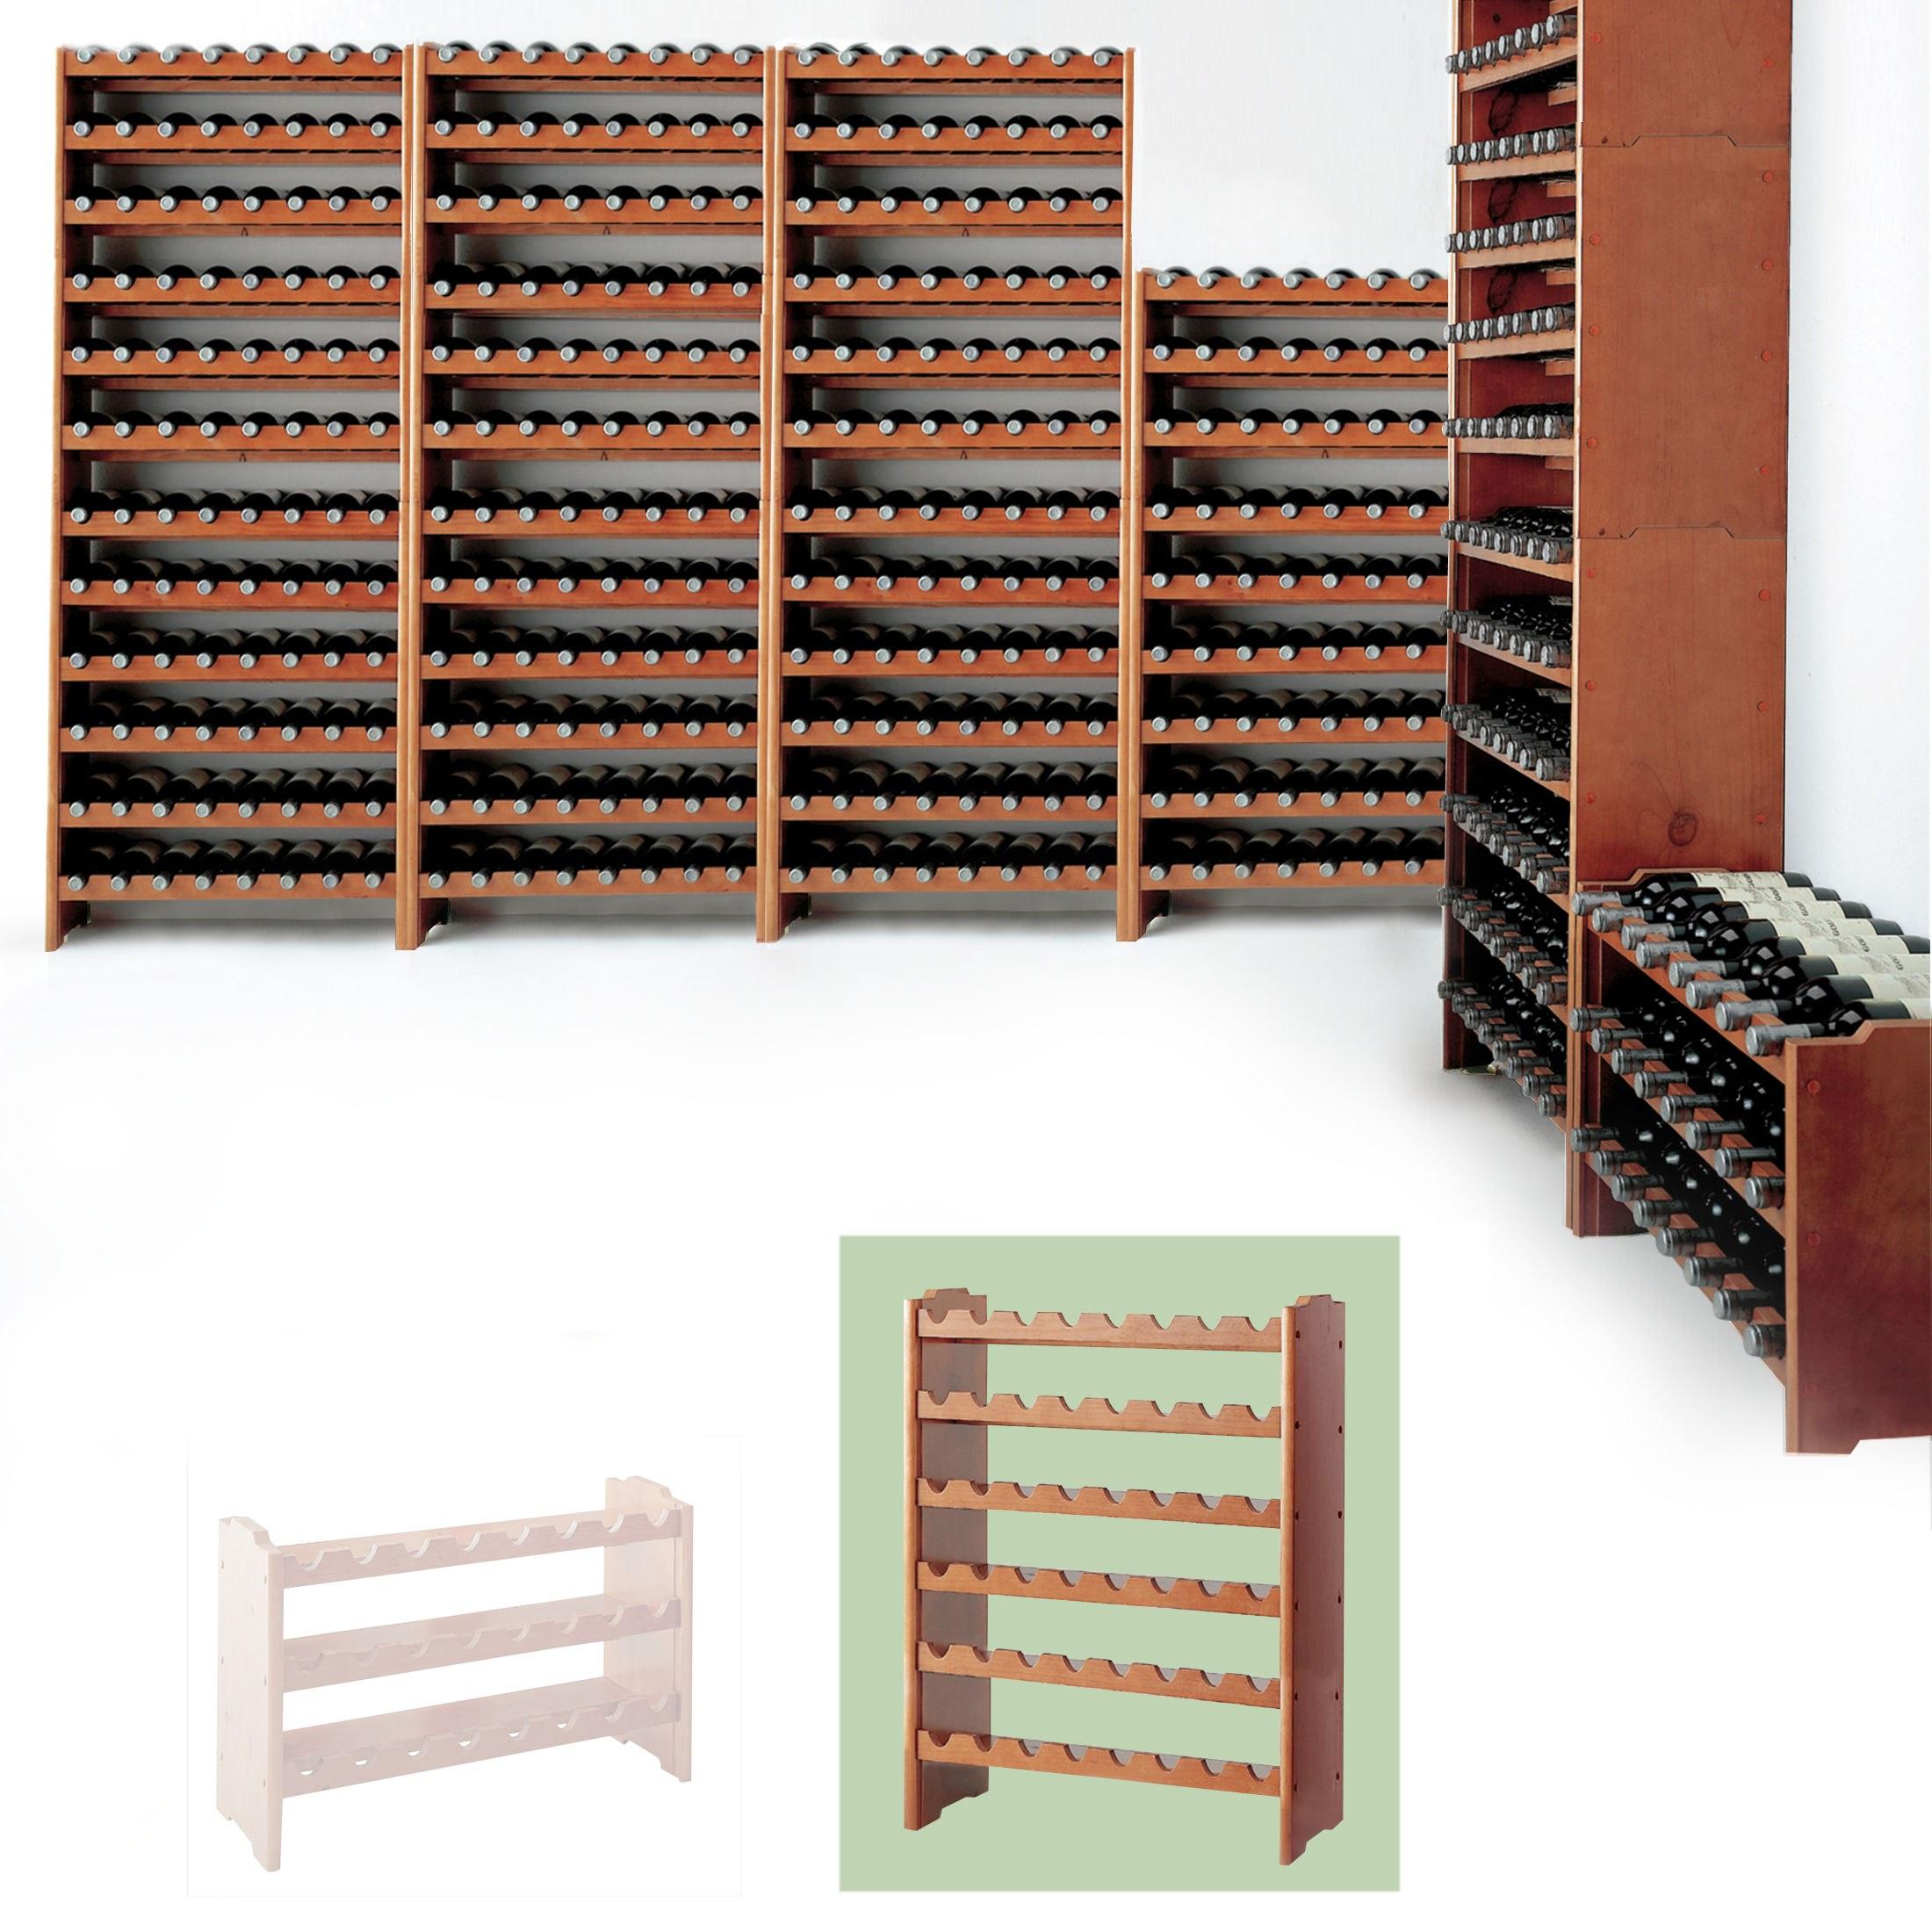 weinregal system medoc holz kiefer dunkelbraun stapelbar. Black Bedroom Furniture Sets. Home Design Ideas